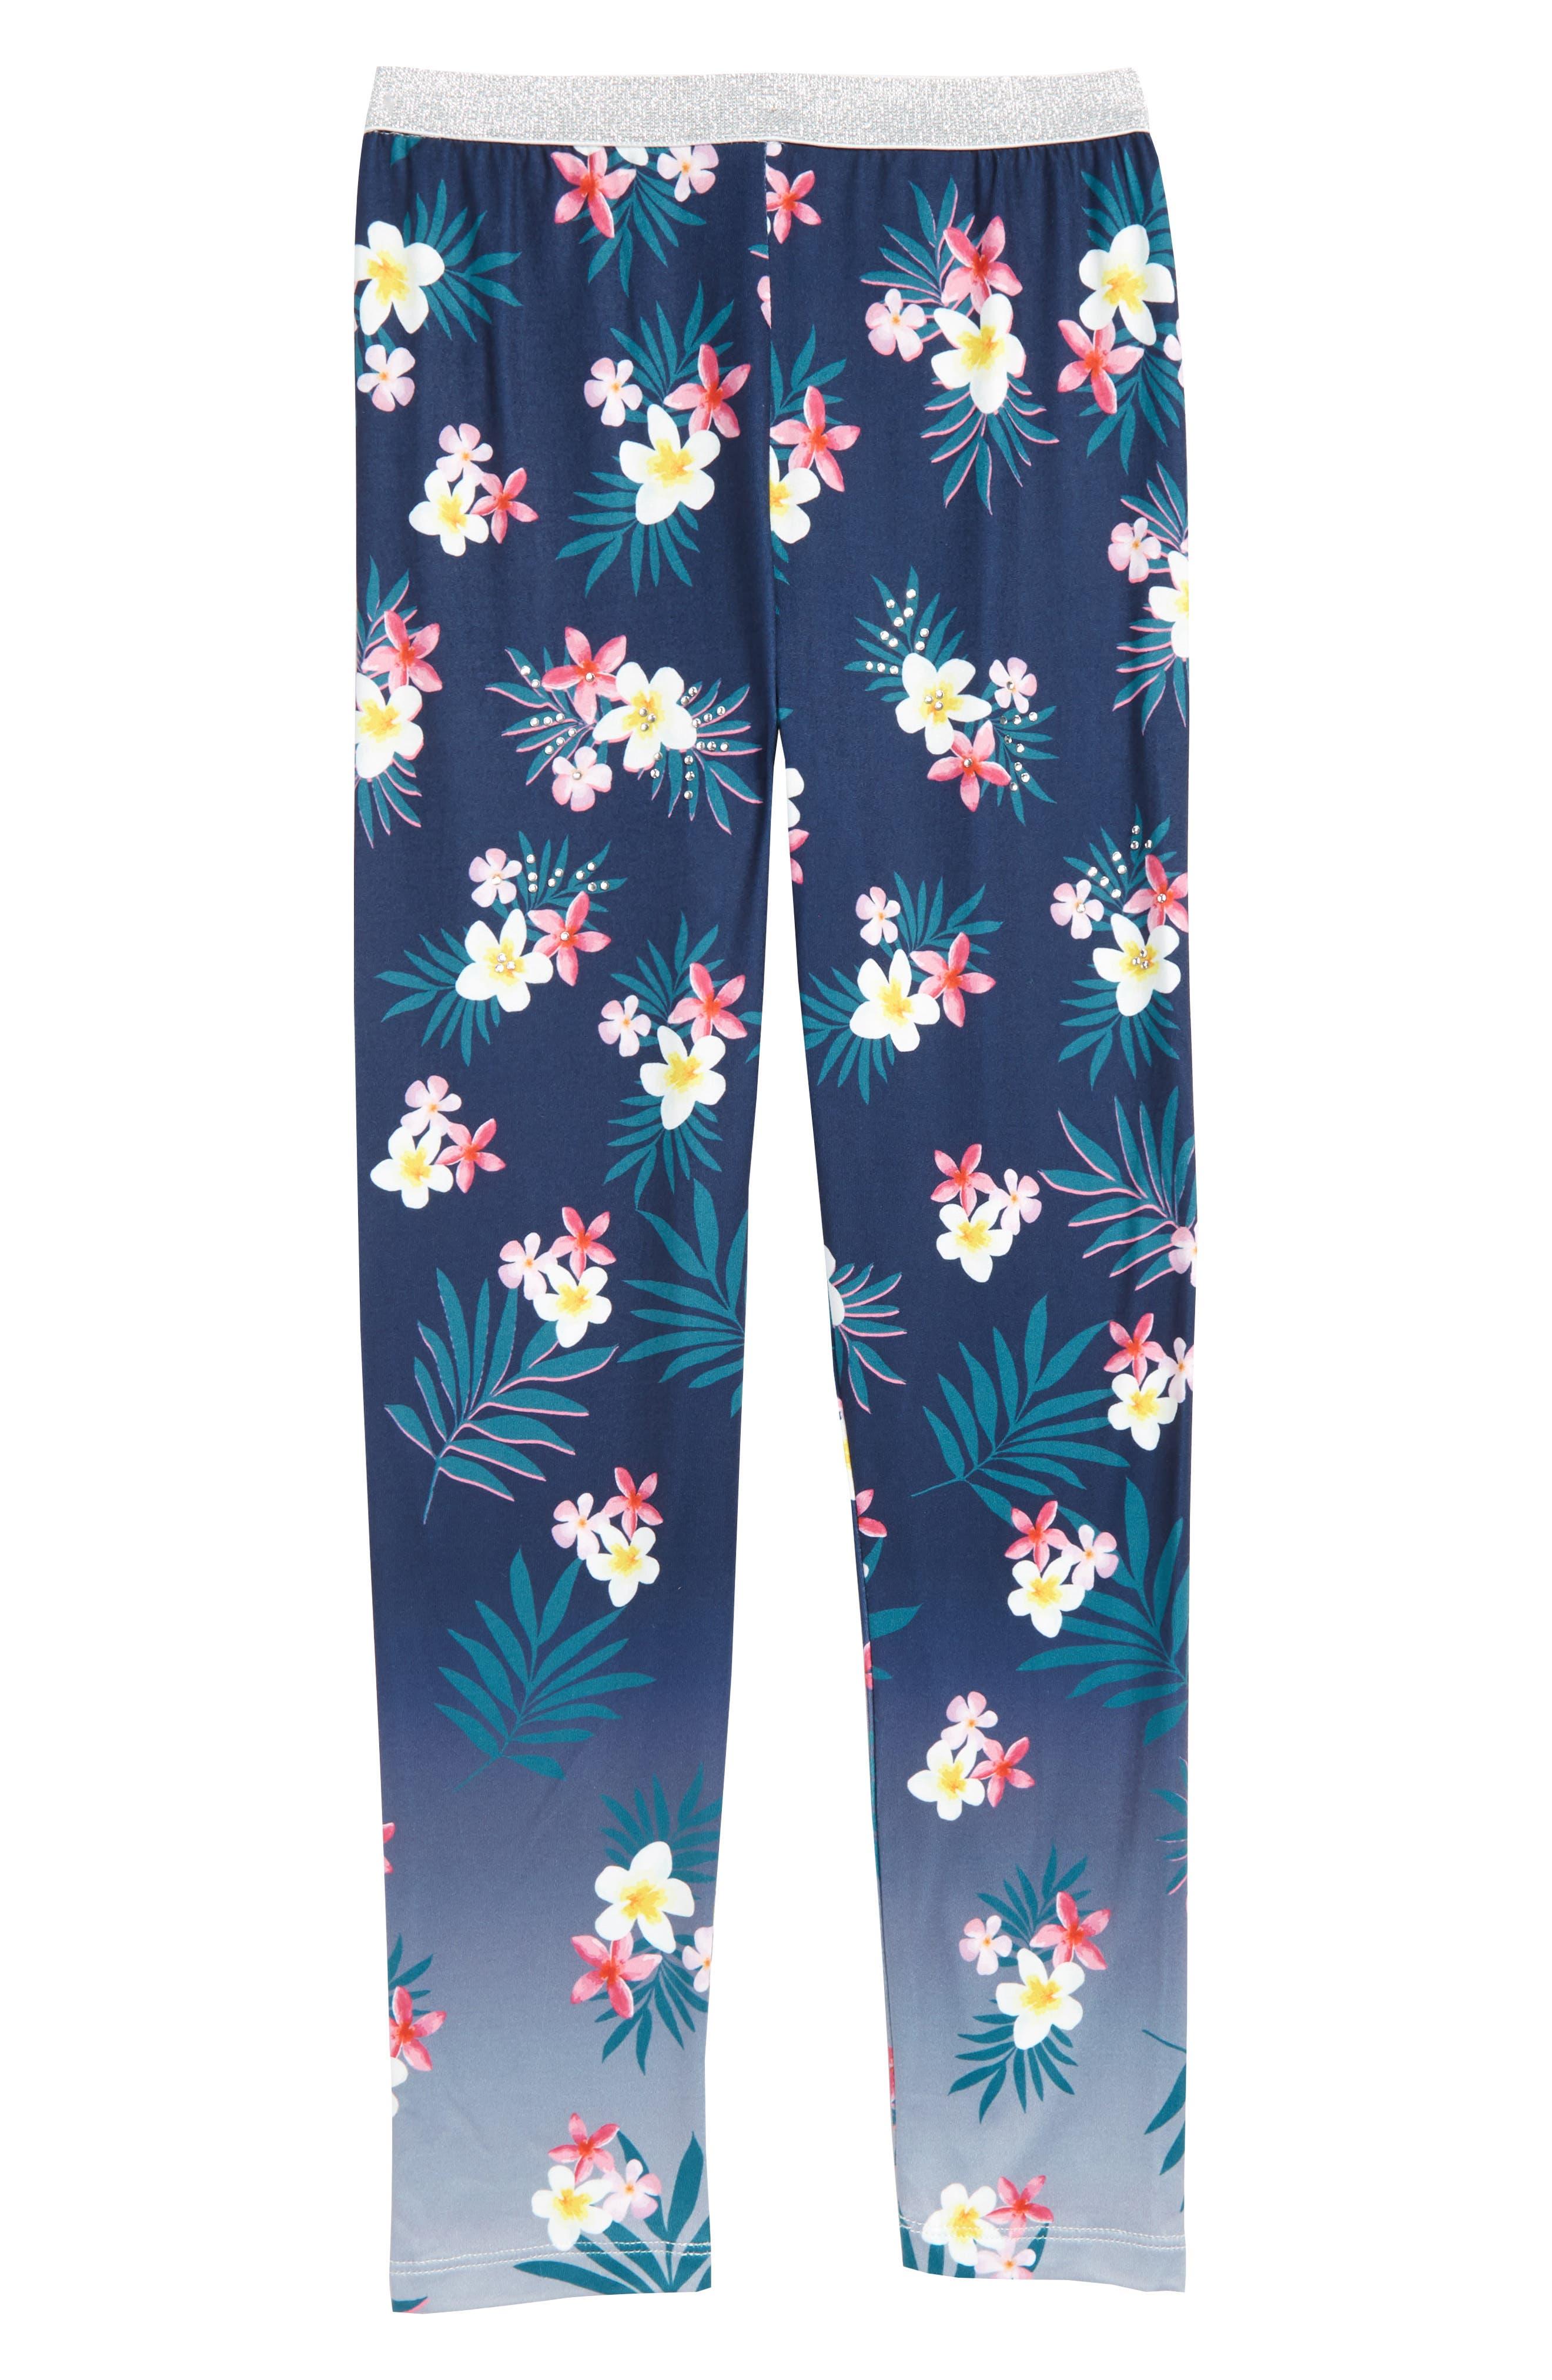 Embellished Floral Print Leggings,                             Main thumbnail 1, color,                             Navy